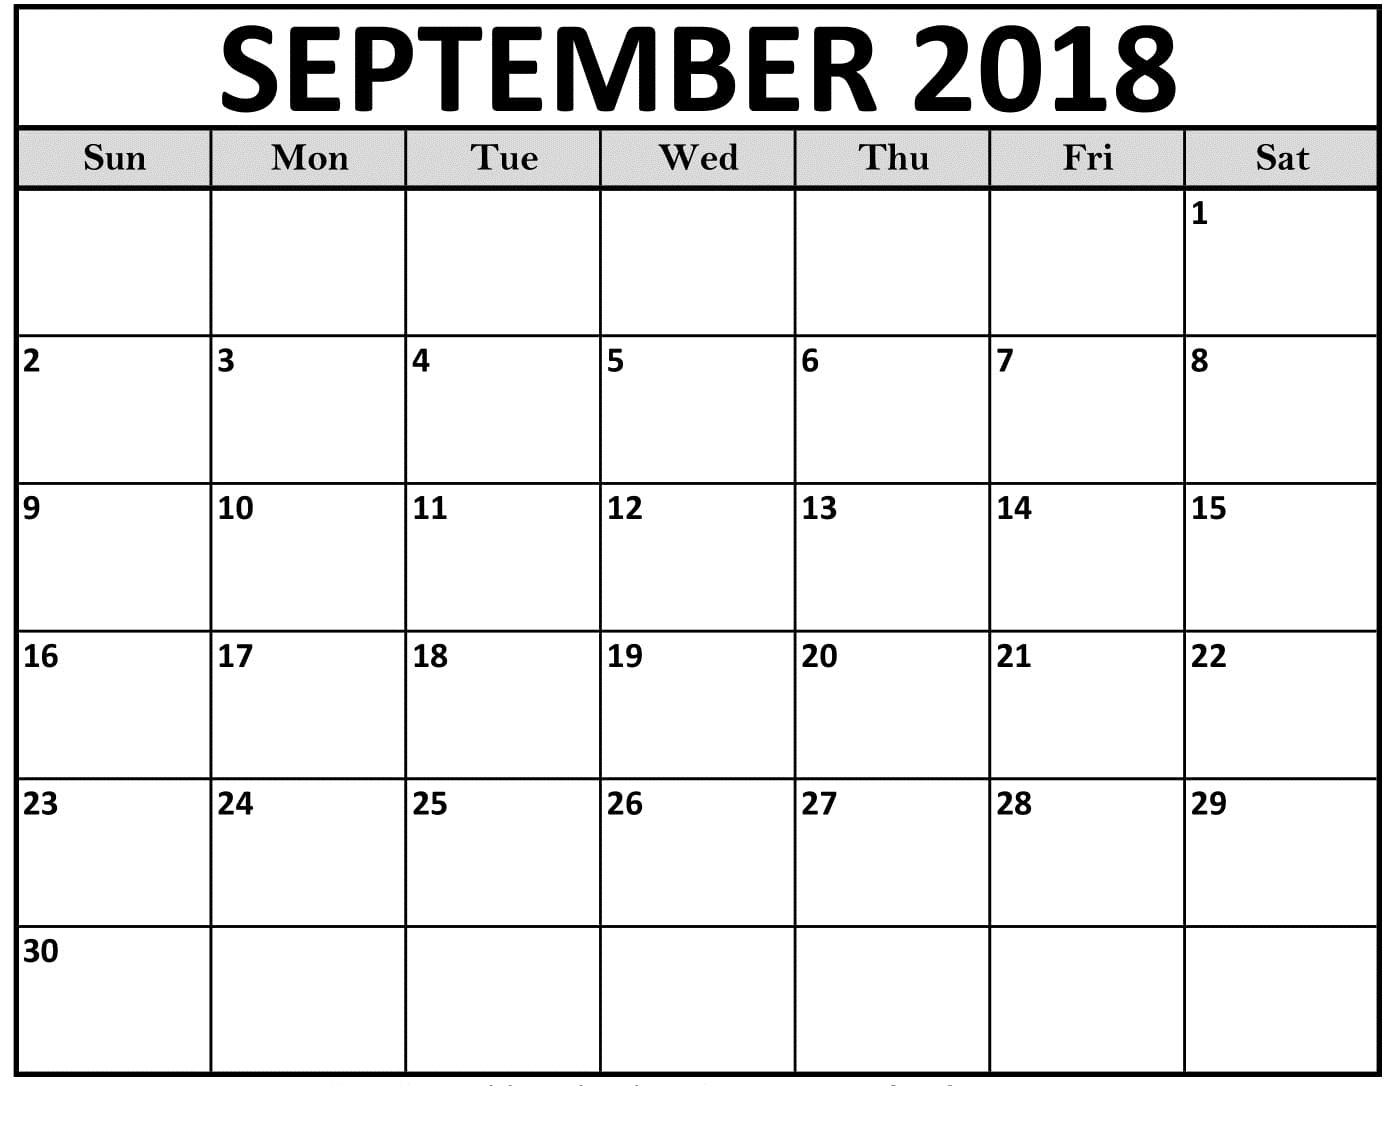 Printable Calendar Template September 2018   Printable Calendar 2019 intended for September Calendar Printable Template